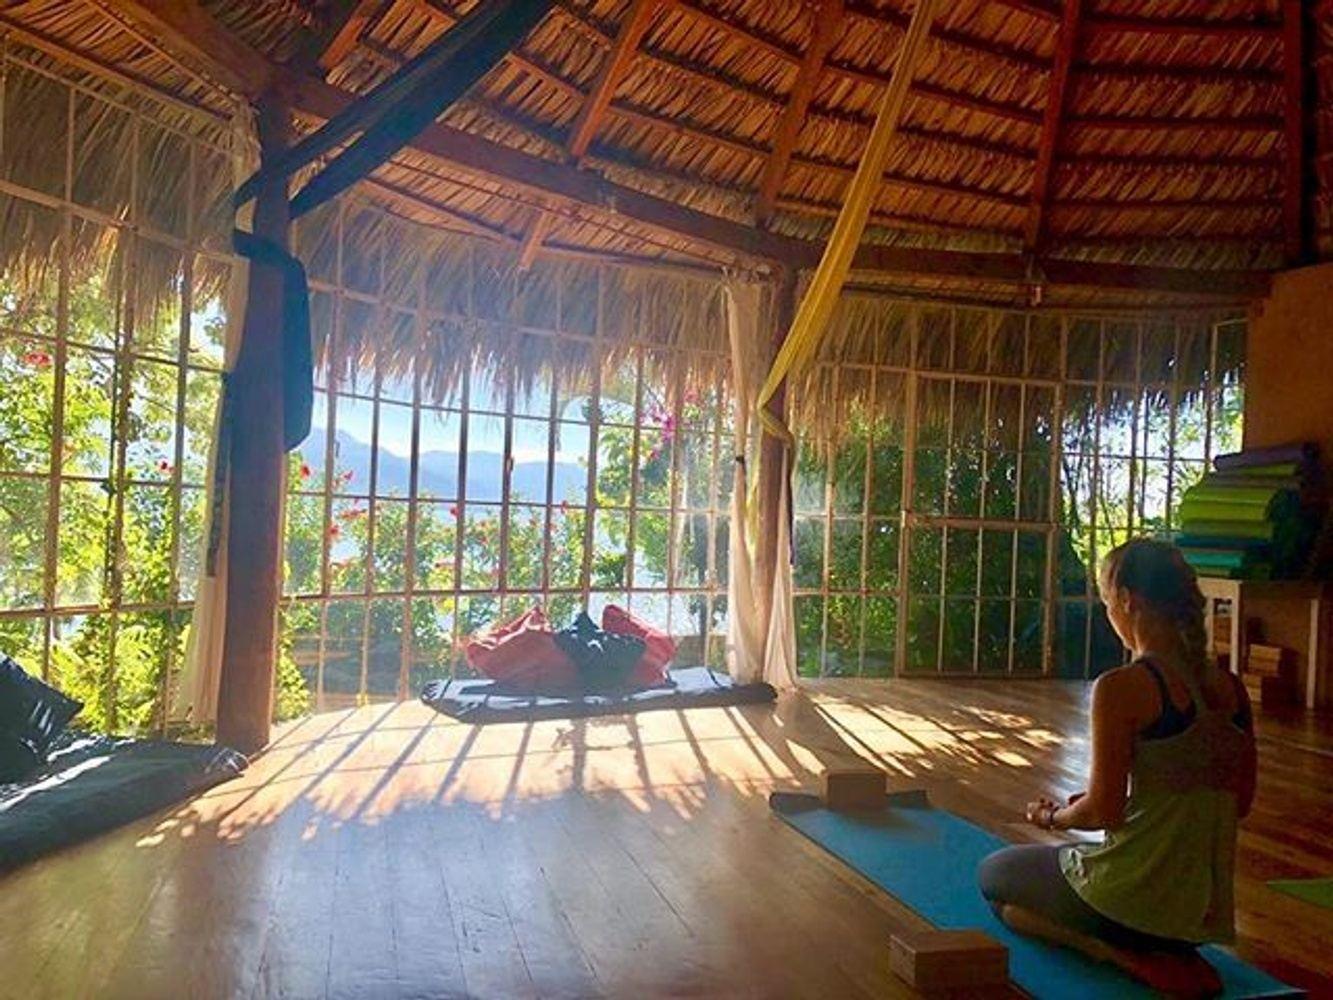 Personal Yoga Retreat at Lake Atitlán, Guatemala